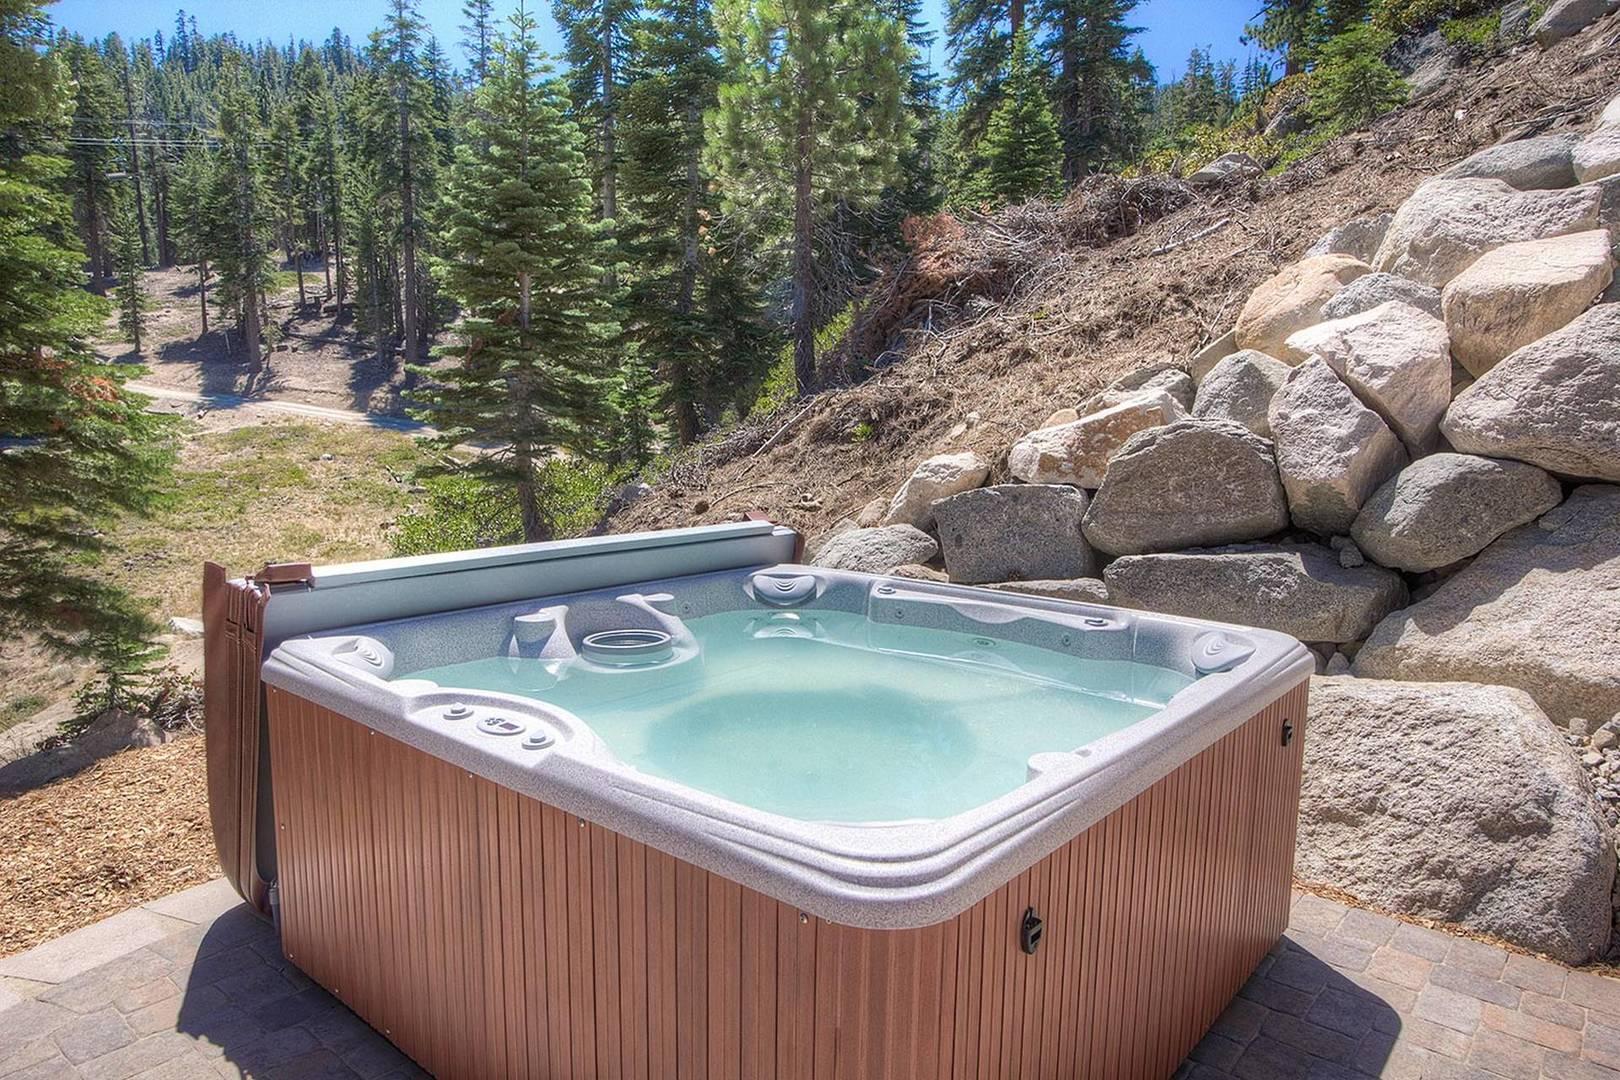 hnh1410 hot tub